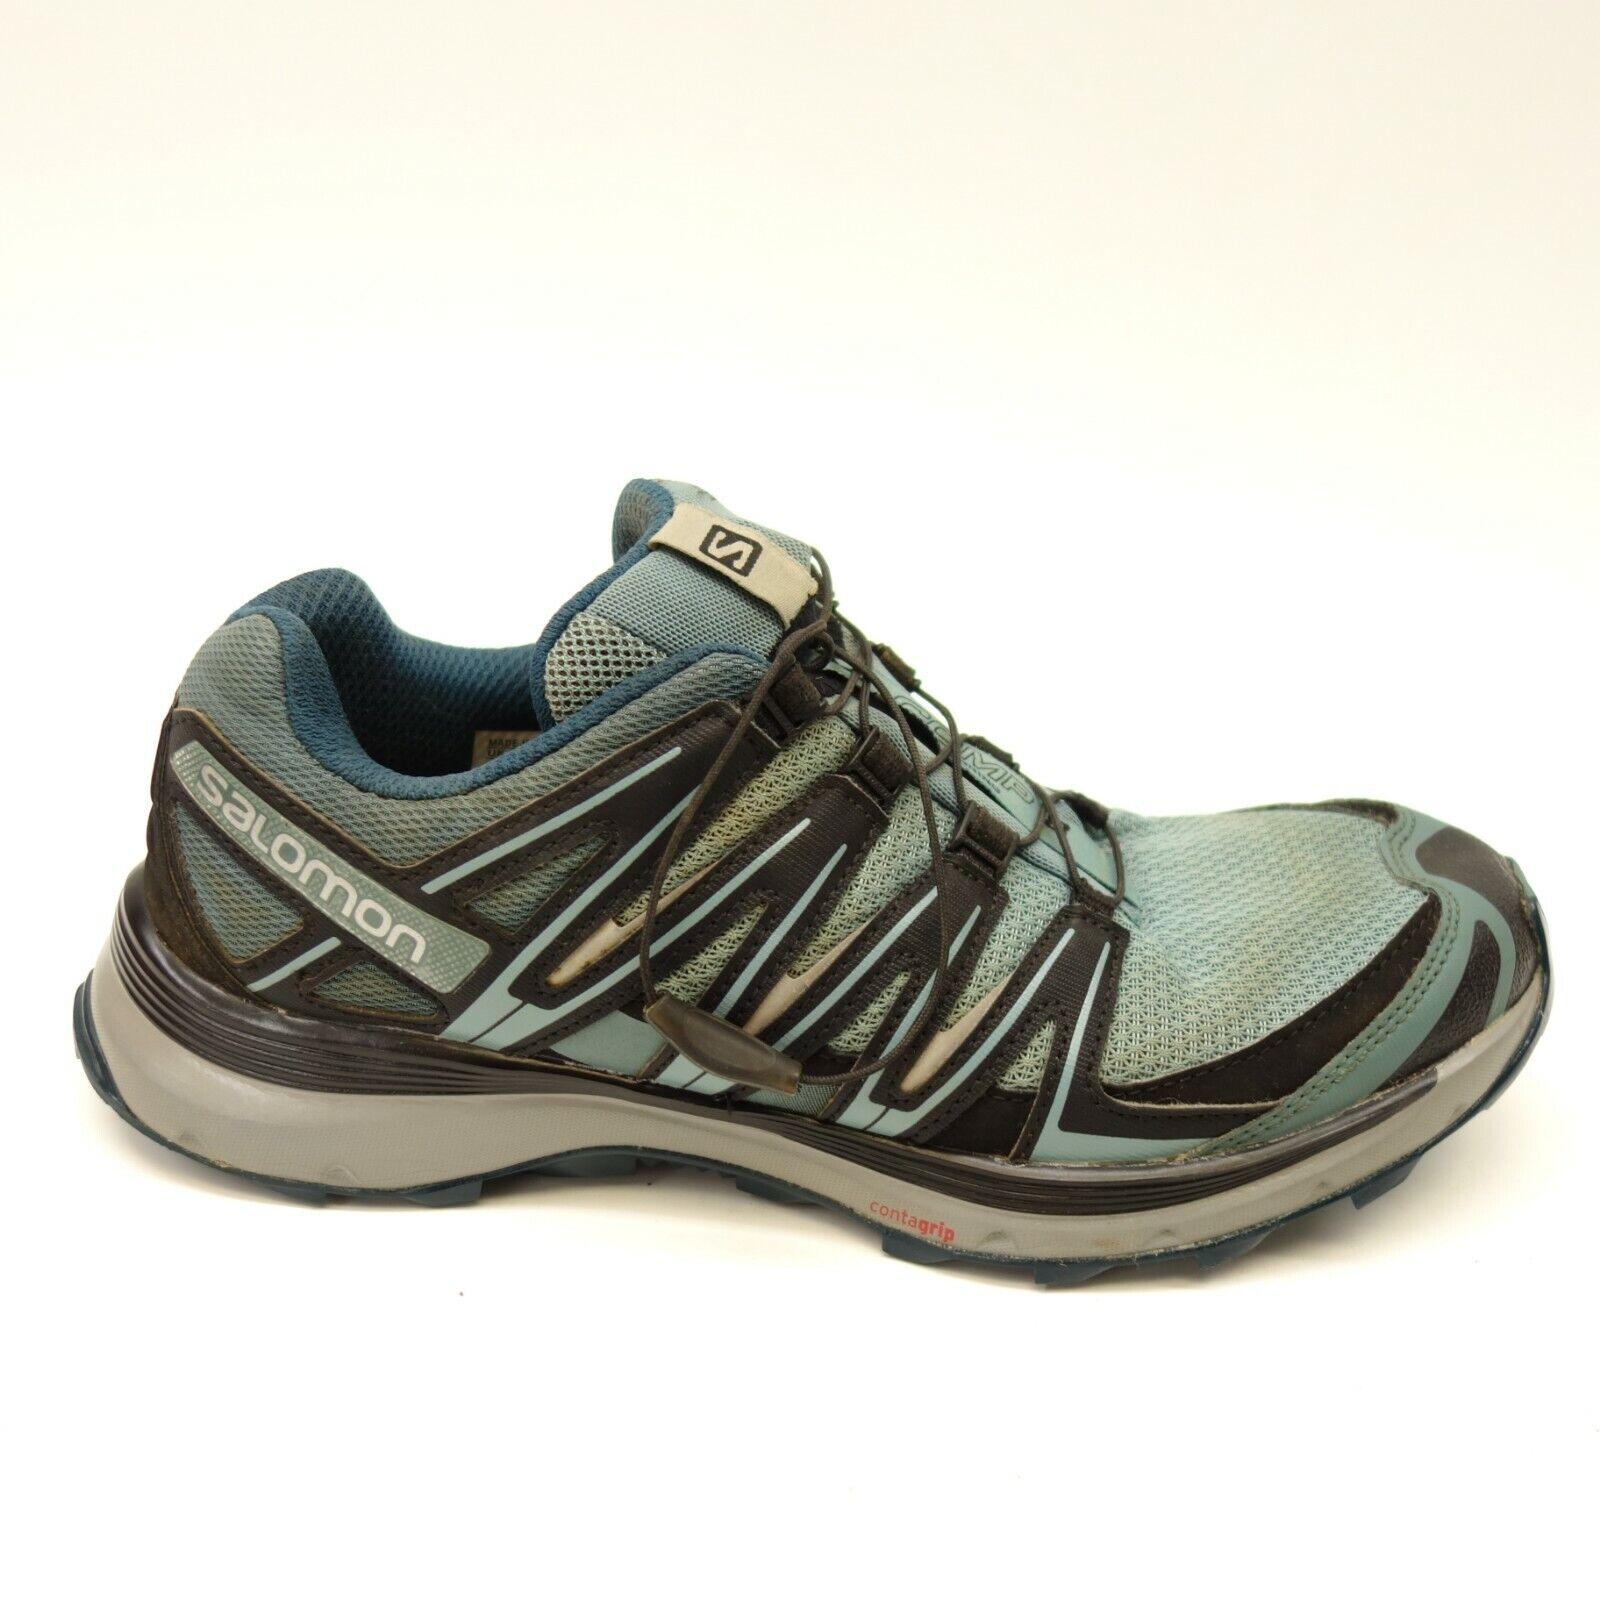 Salomon Mujer XA COMP 8 Trail-correr Exterior Excursionismo Atléticas Zapatos para correr 9.5